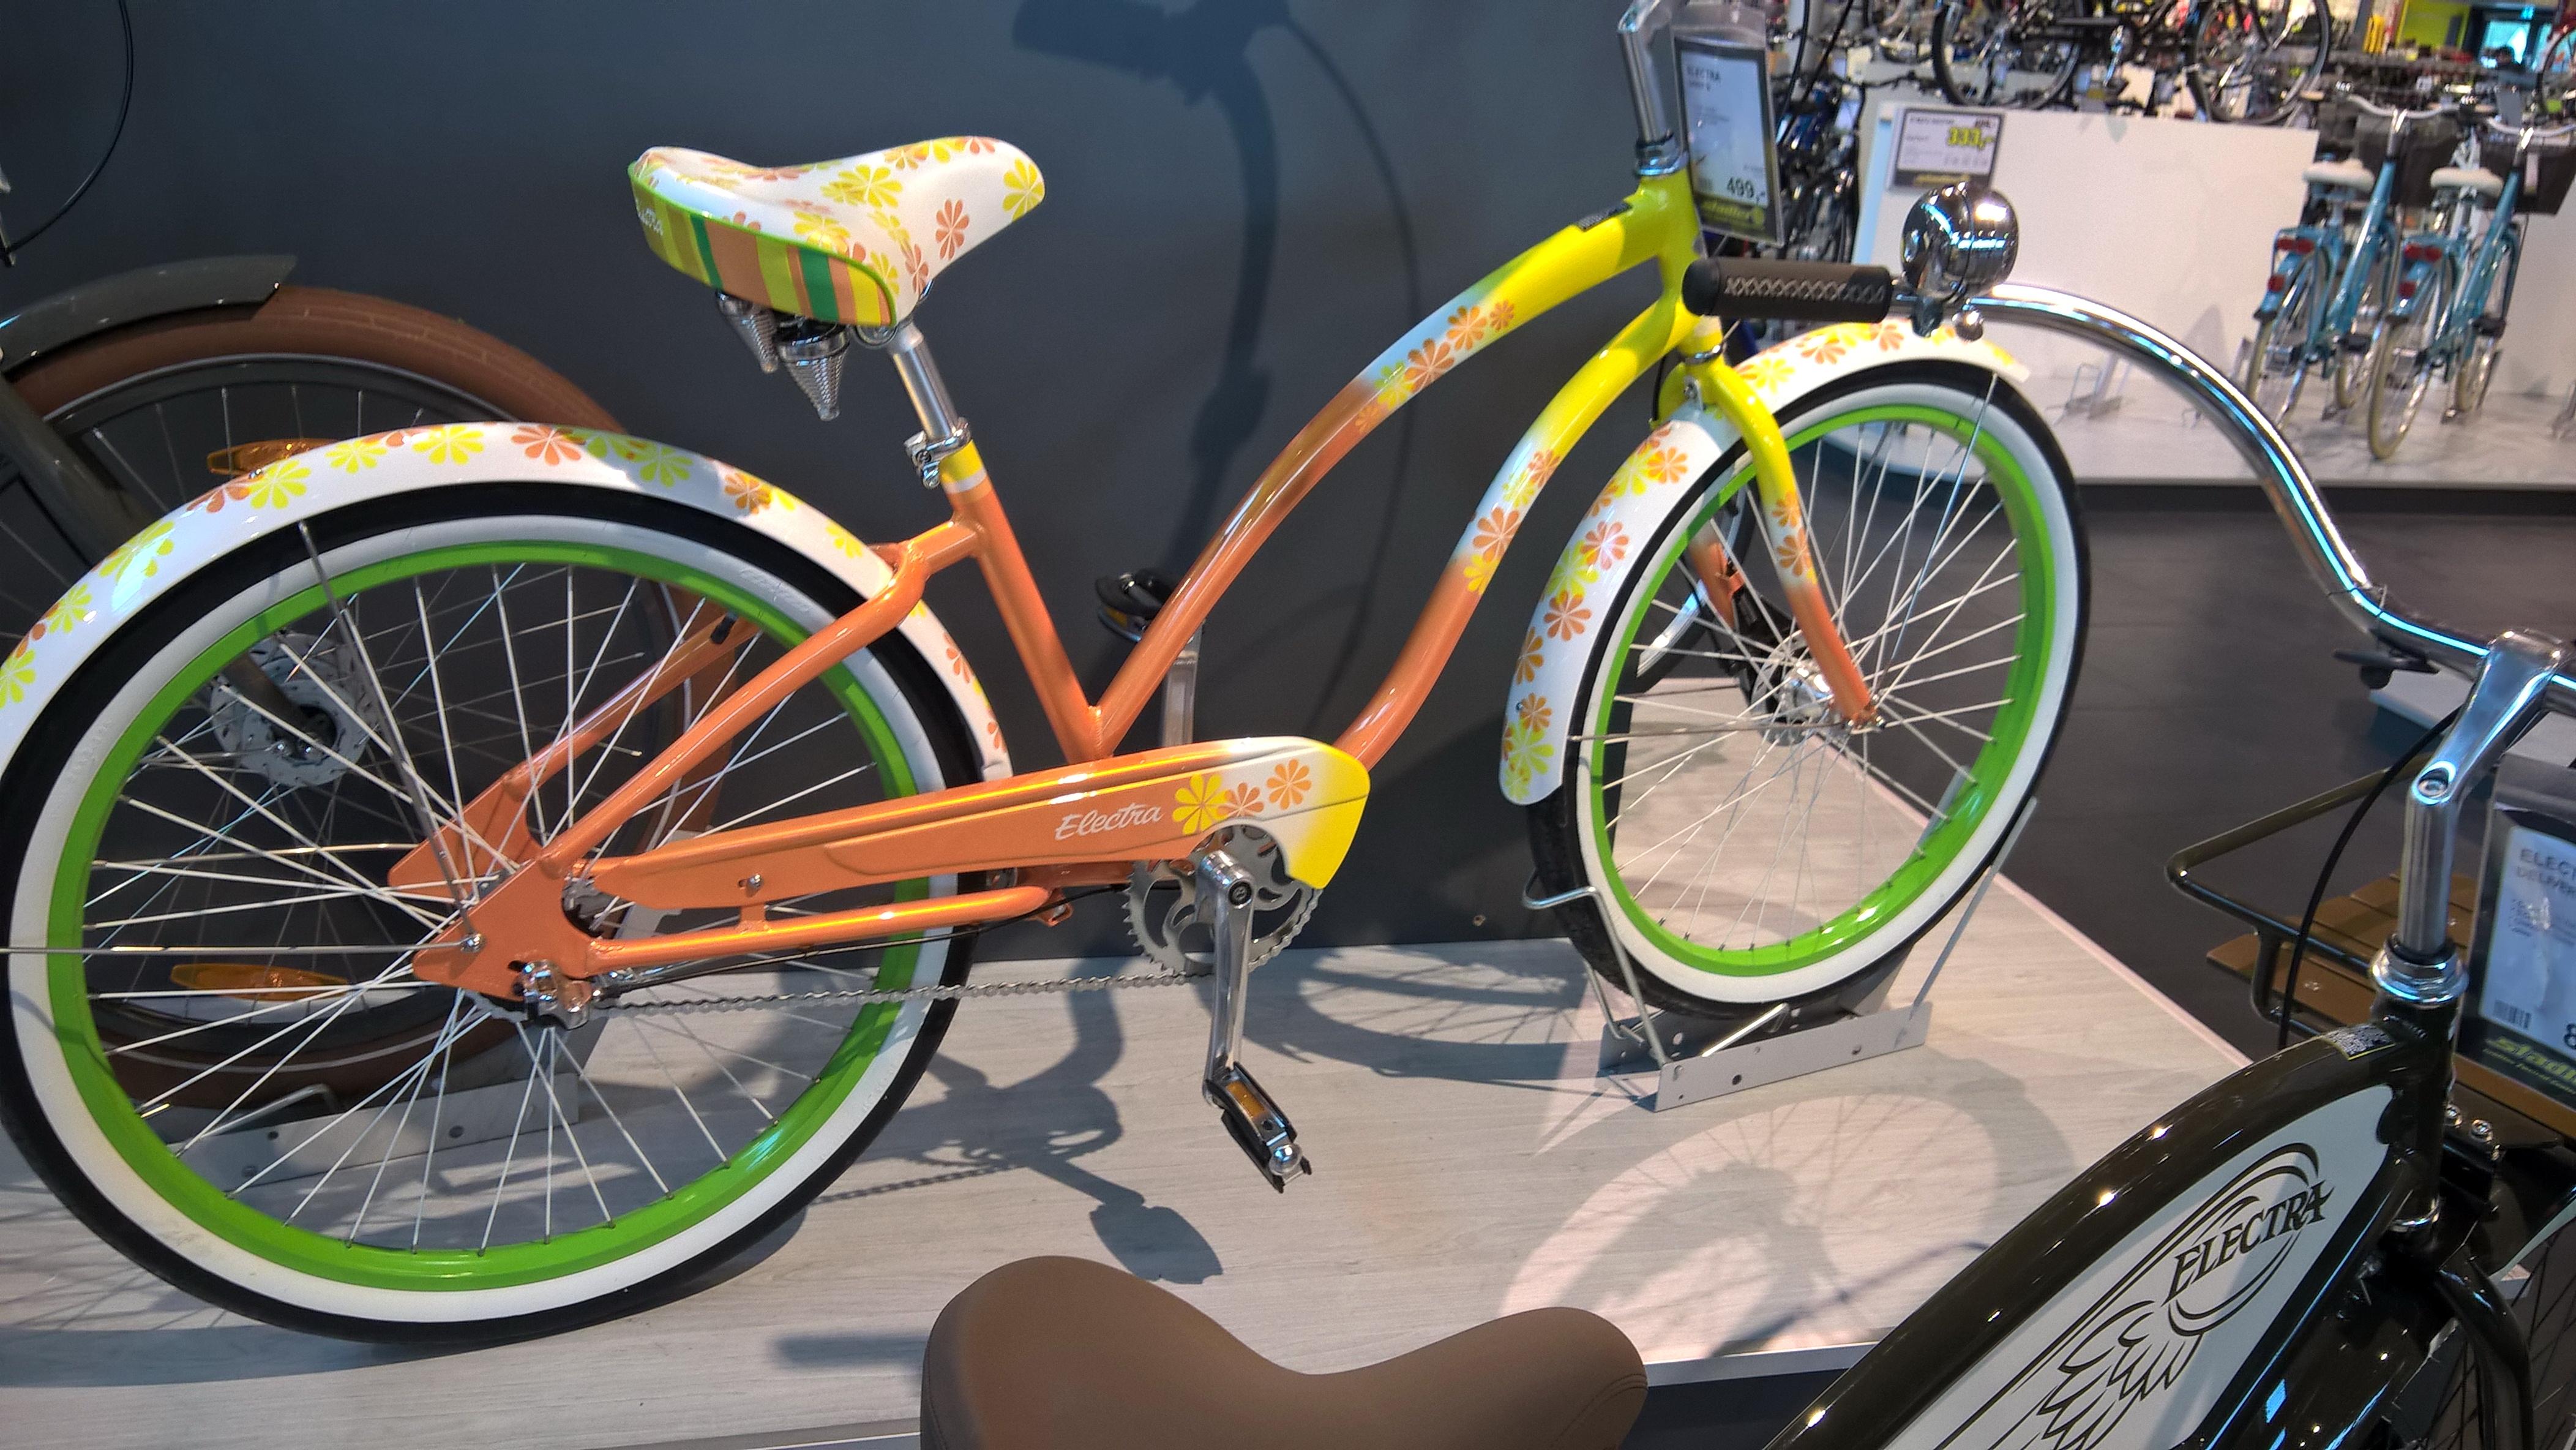 16-07-20-Electra-Bike-WP 20160711 14 46 40 Pro.jpg